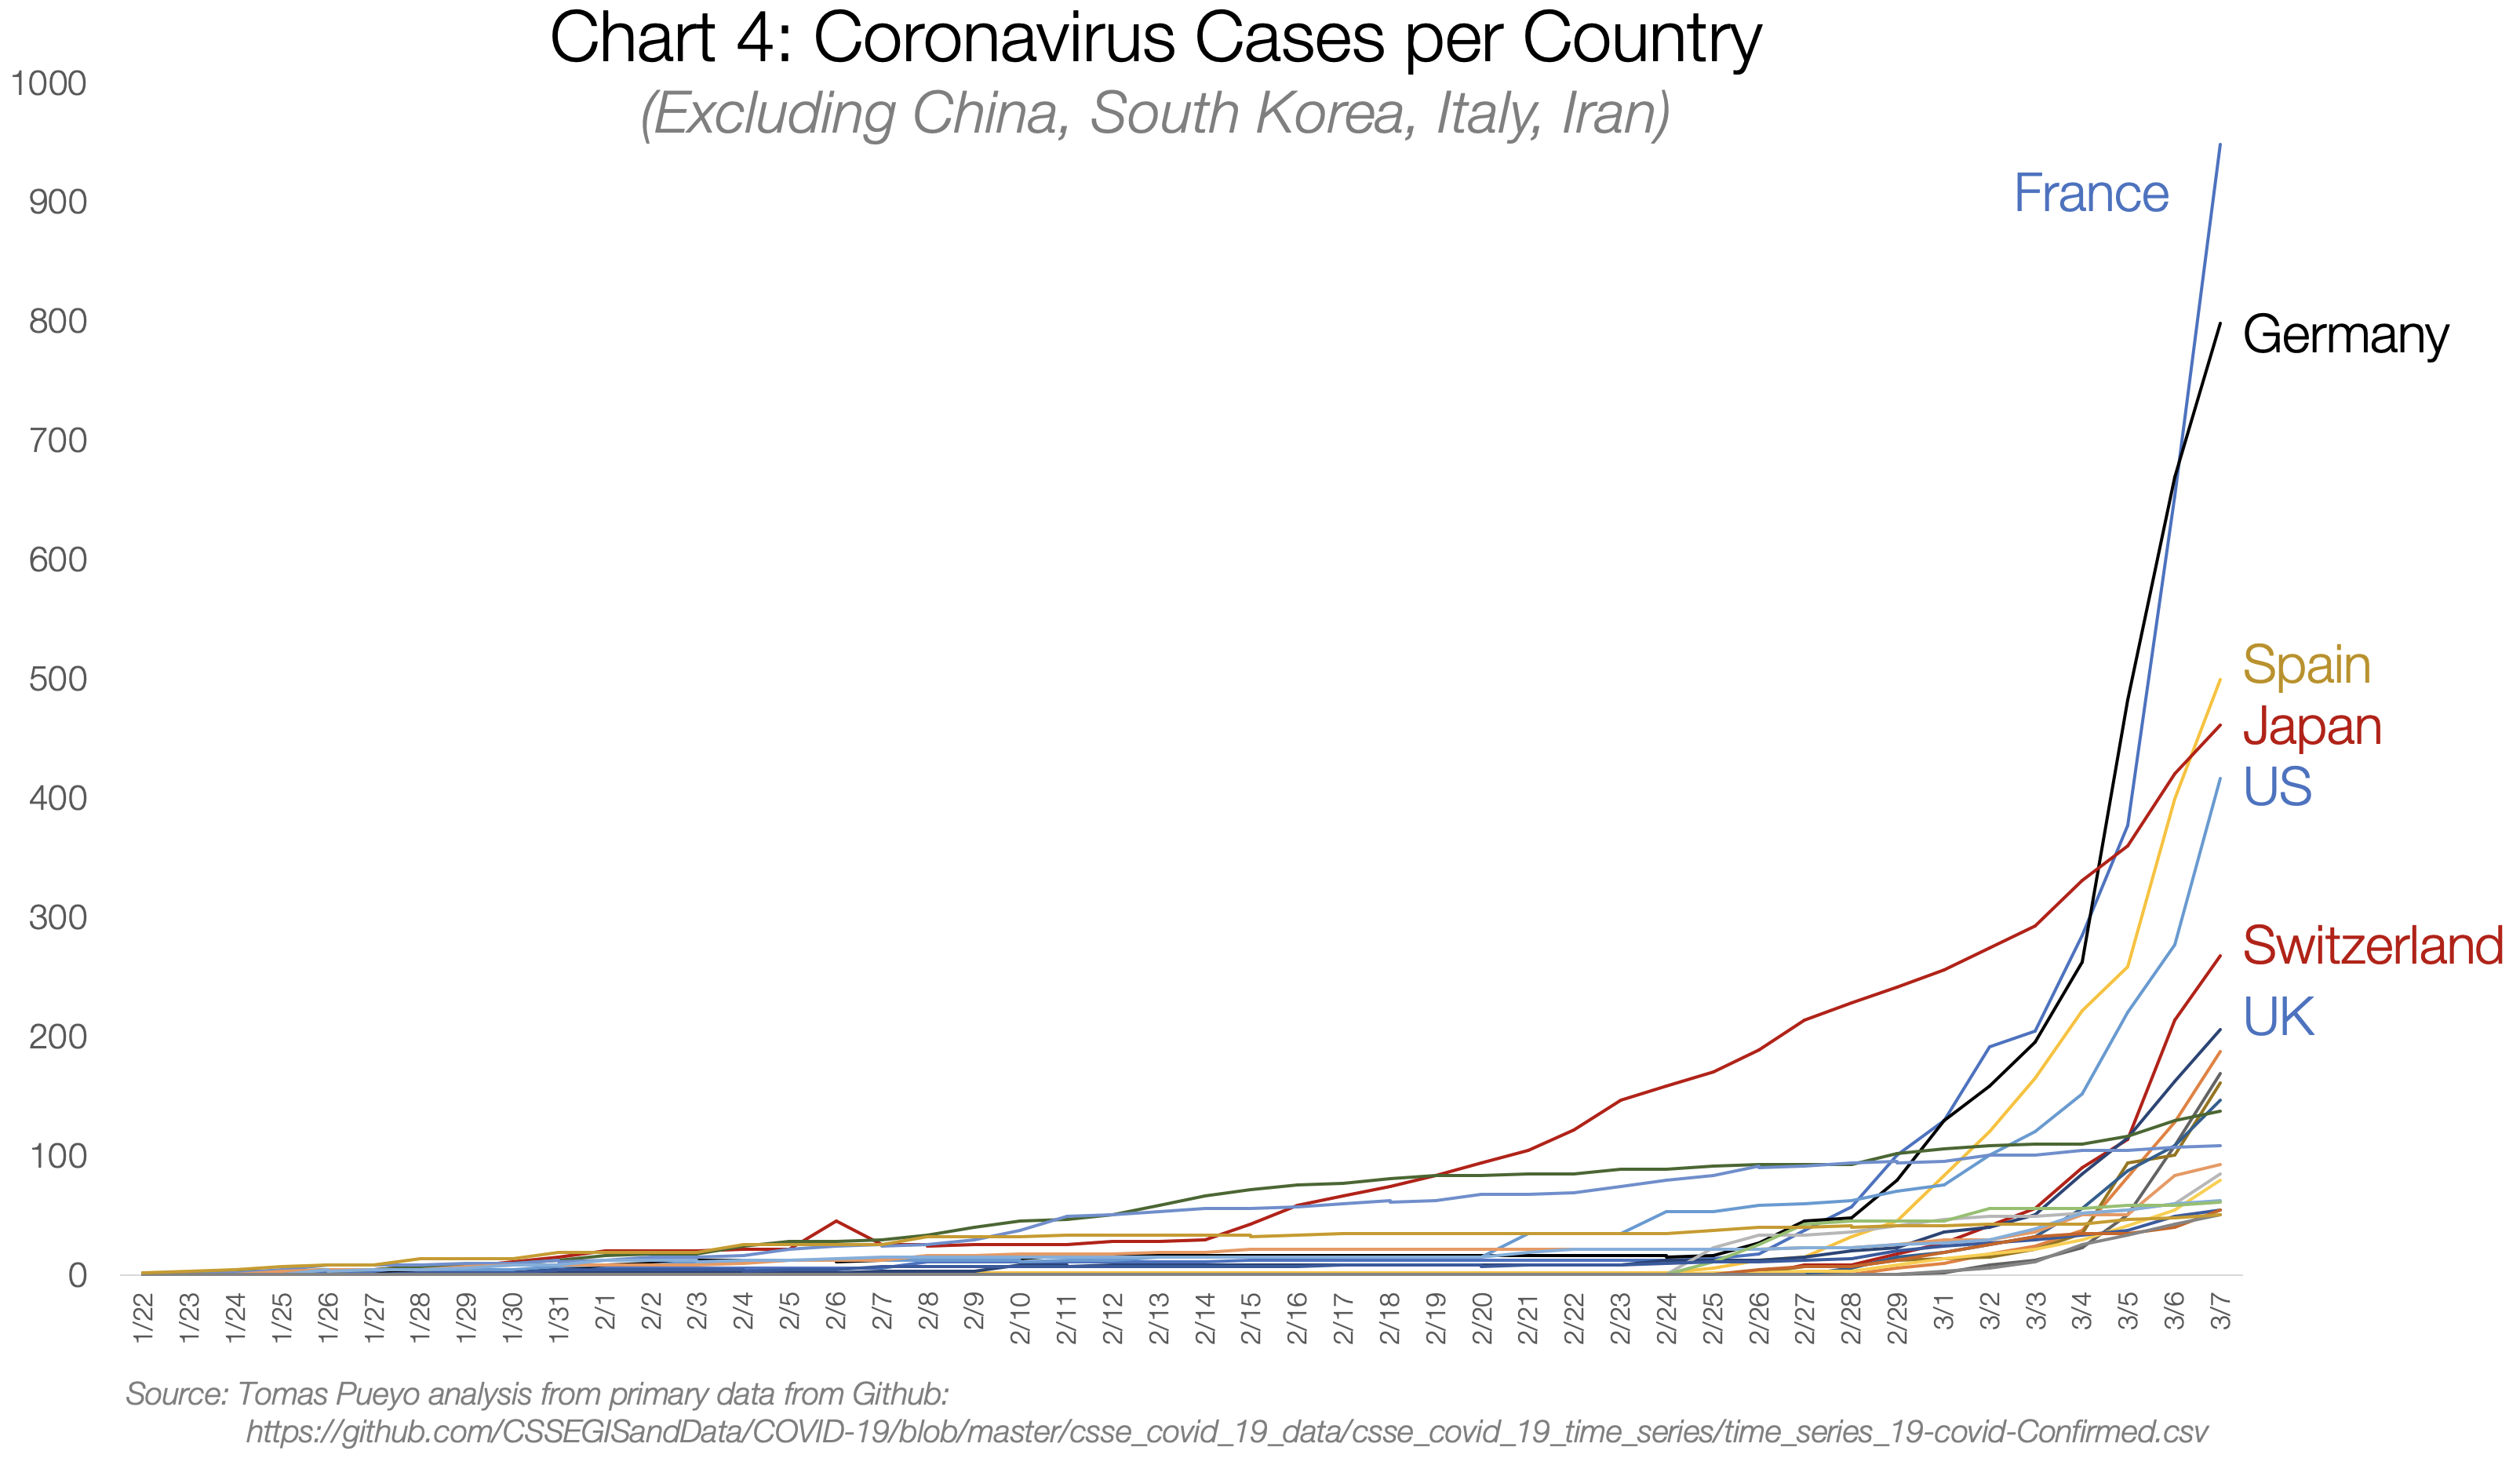 4. Coronavirus Cases per Country